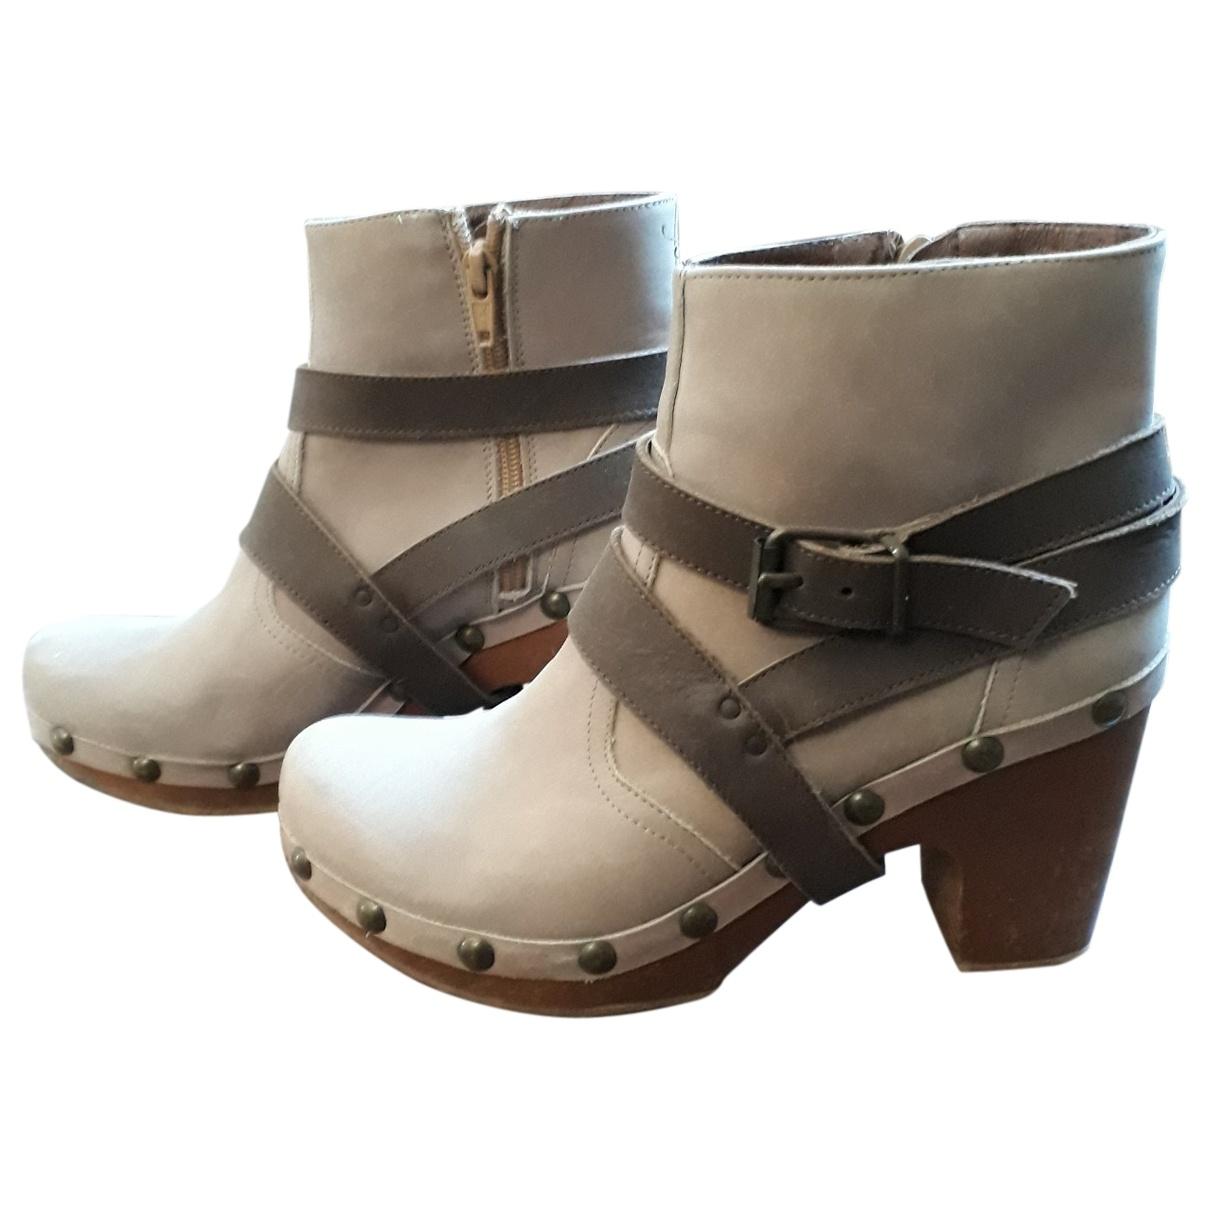 Tatoosh \N Beige Suede Ankle boots for Women 38 EU